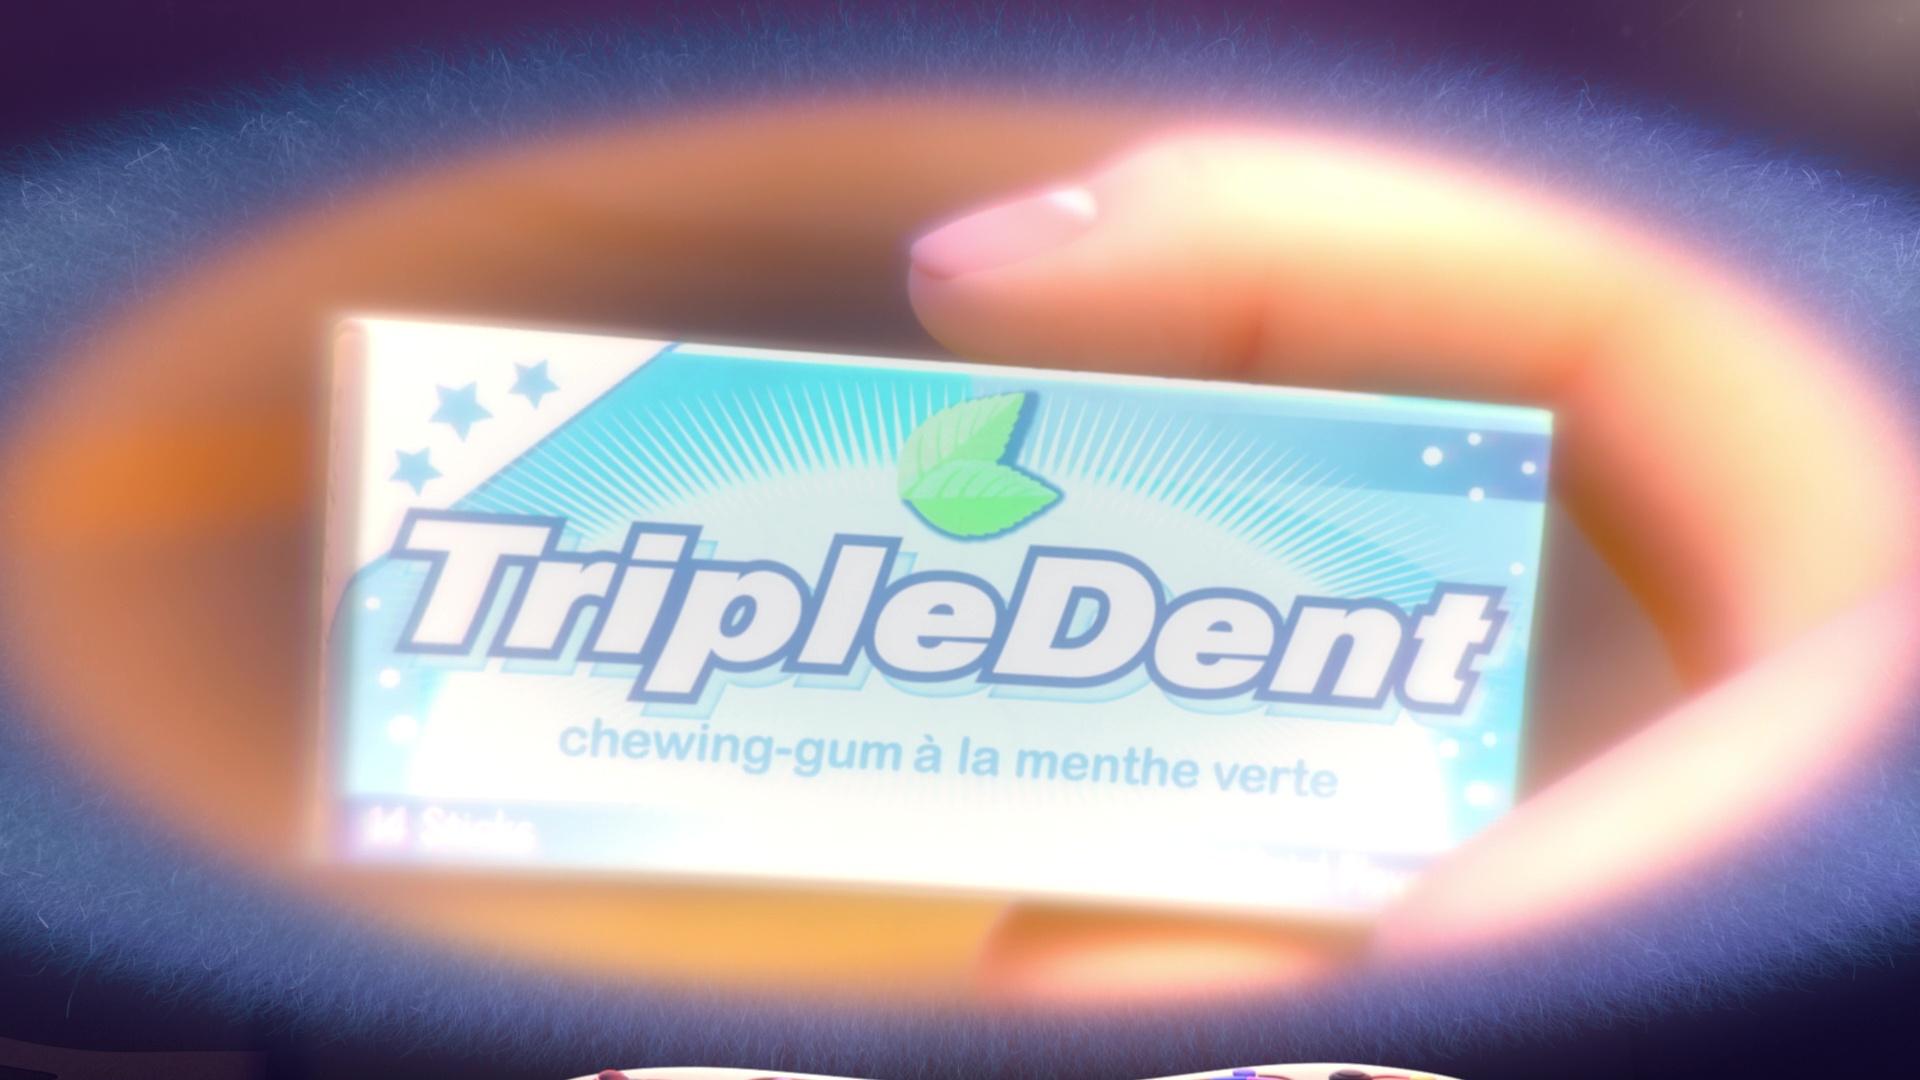 tripledent-gum-02